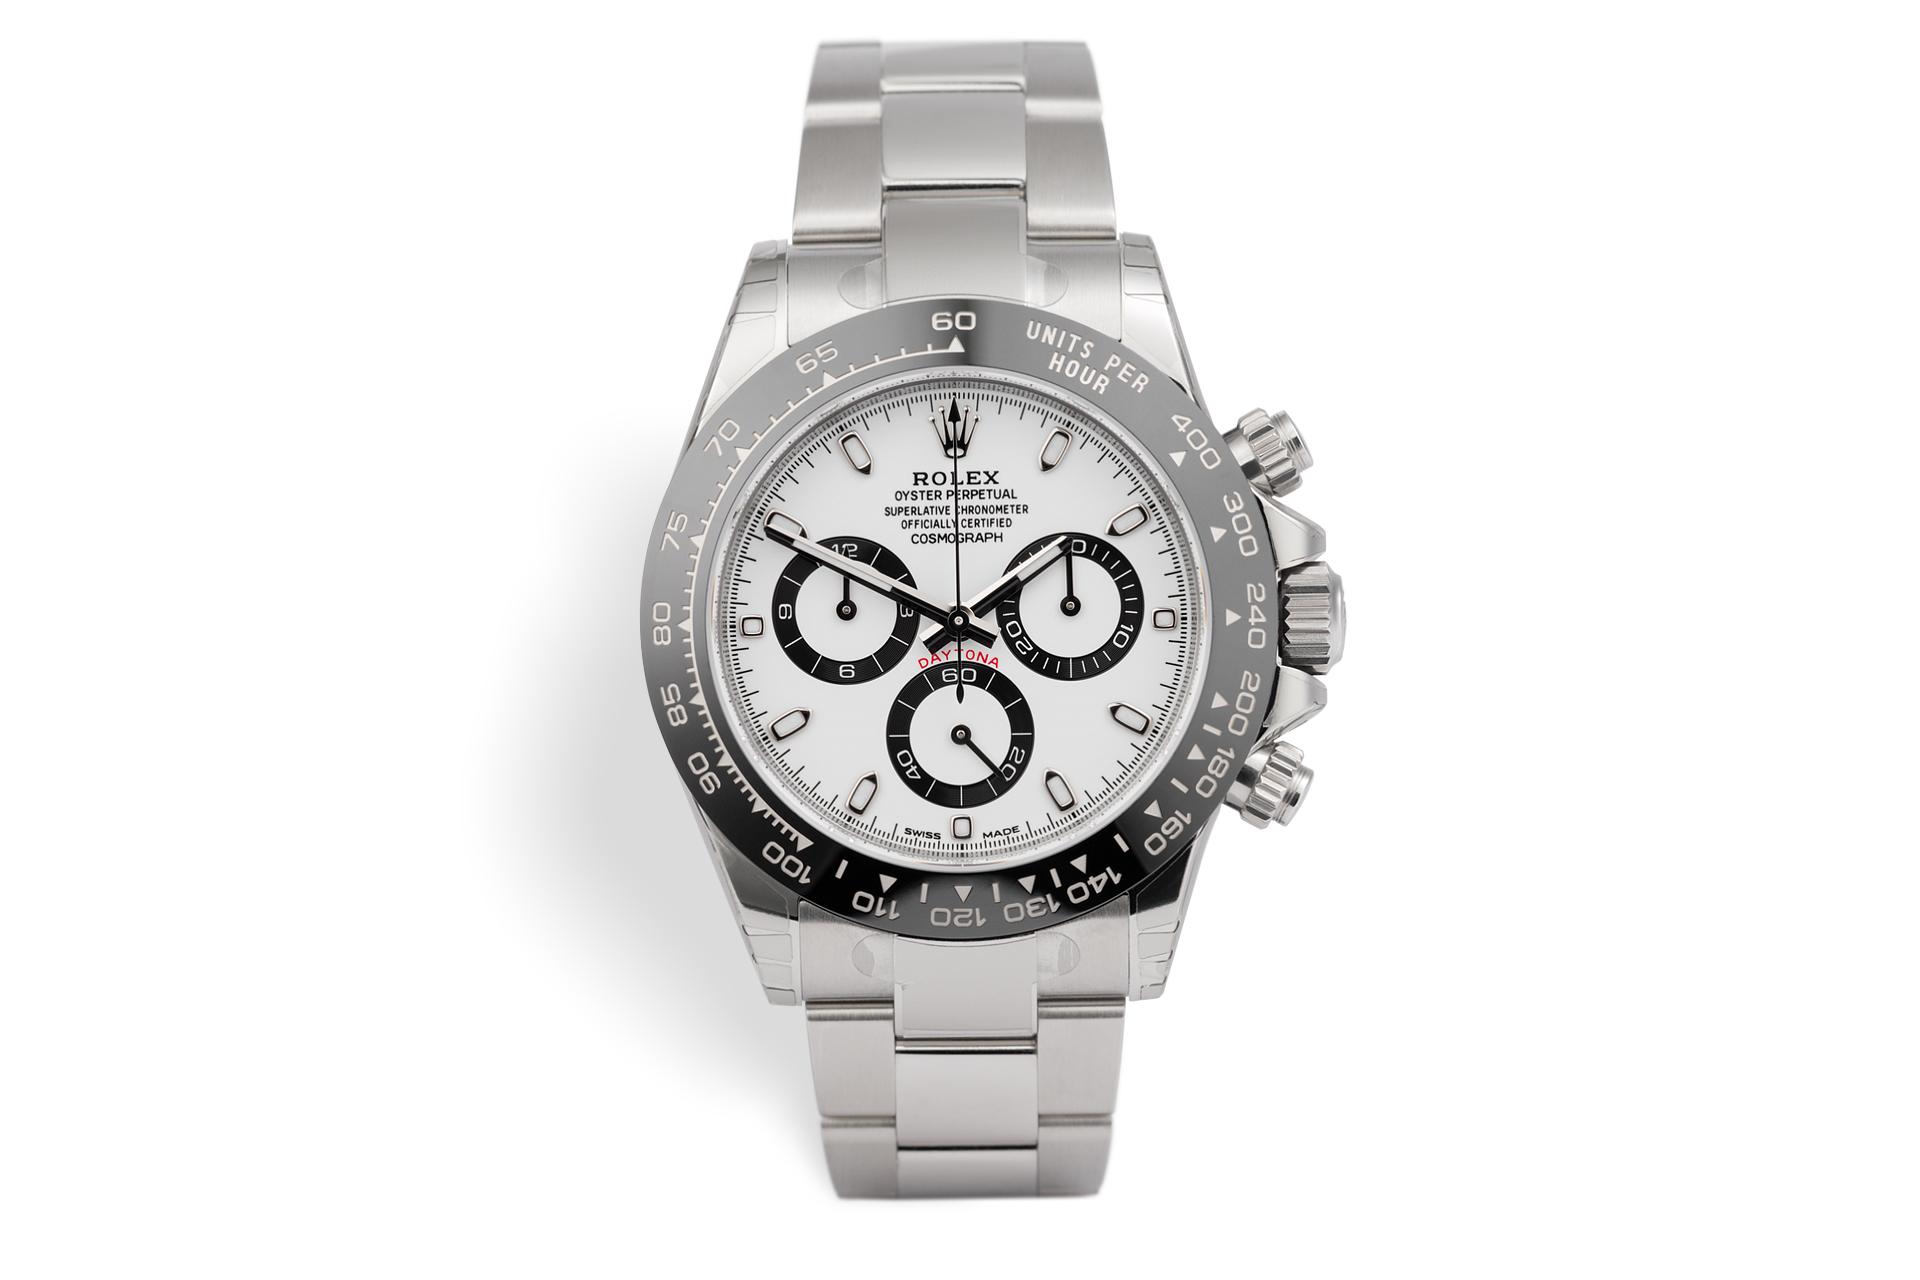 hot sale online 49095 bb270 Rolex Cosmograph Daytona Watches | ref 116500LN | Brand New ...